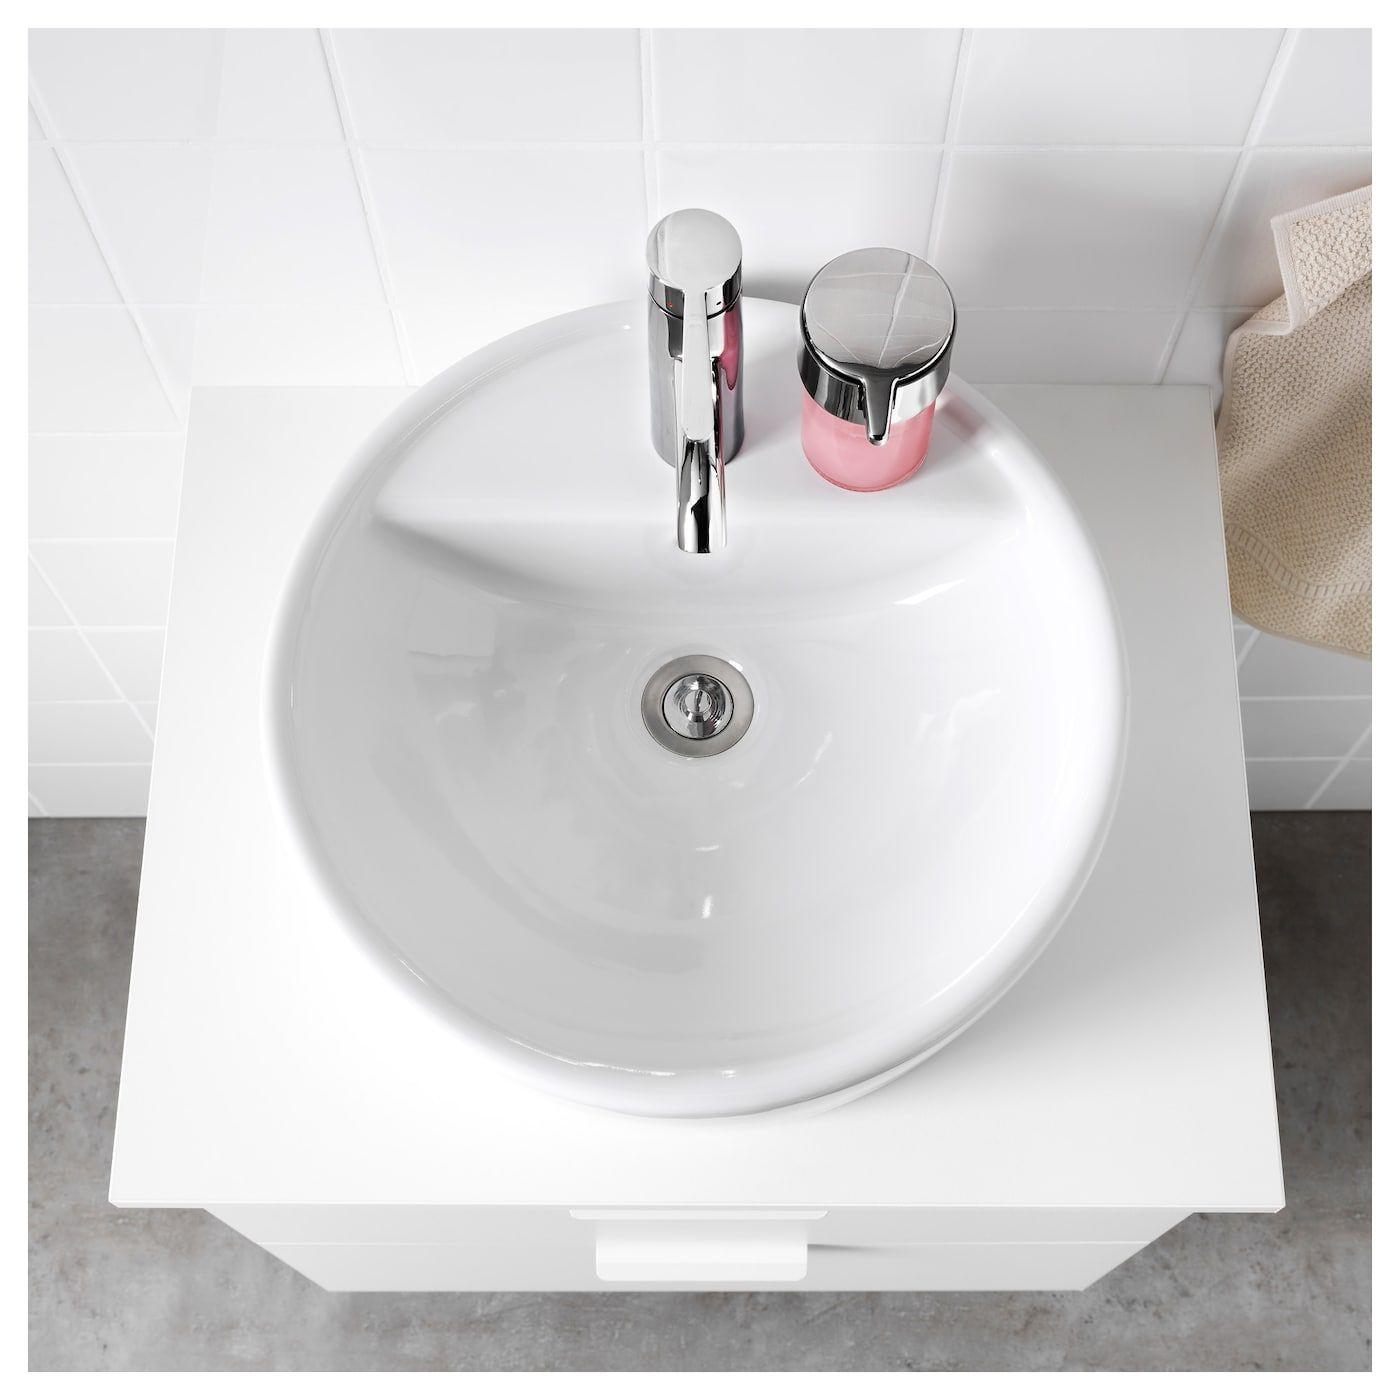 Ikea Tornviken Countertop Sink White Sink Countertop Sink